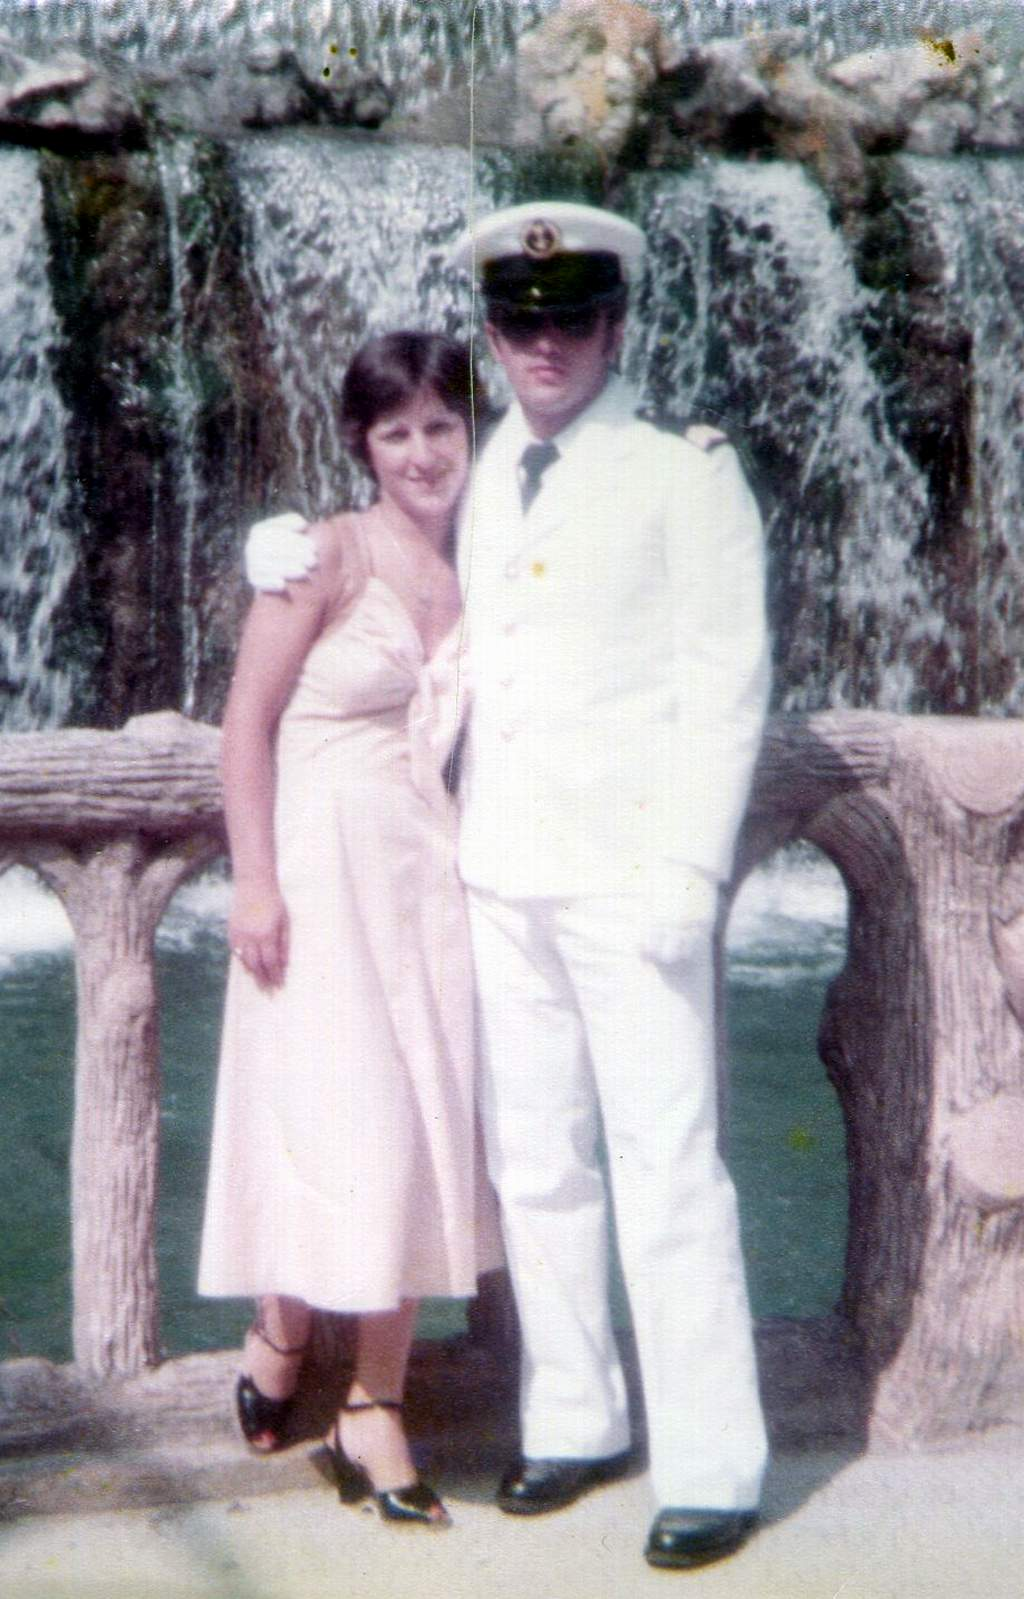 [Les traditions dans la Marine] Mariage en tenue - Page 5 742420img896